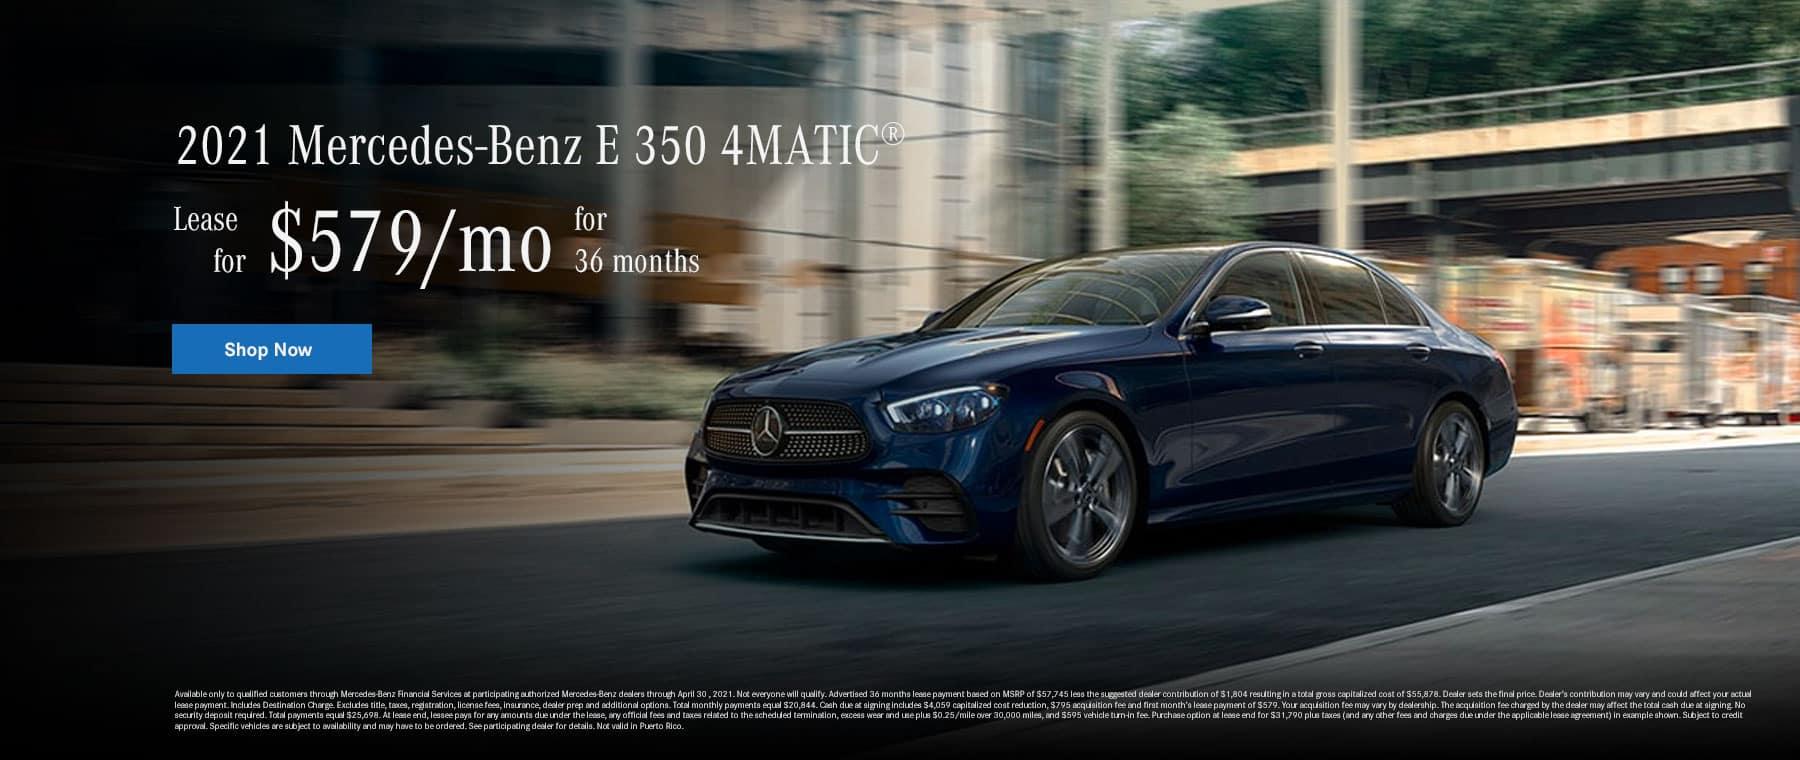 2021 Mercedes-Benz E350 4MATIC - $579/mo for 36 months